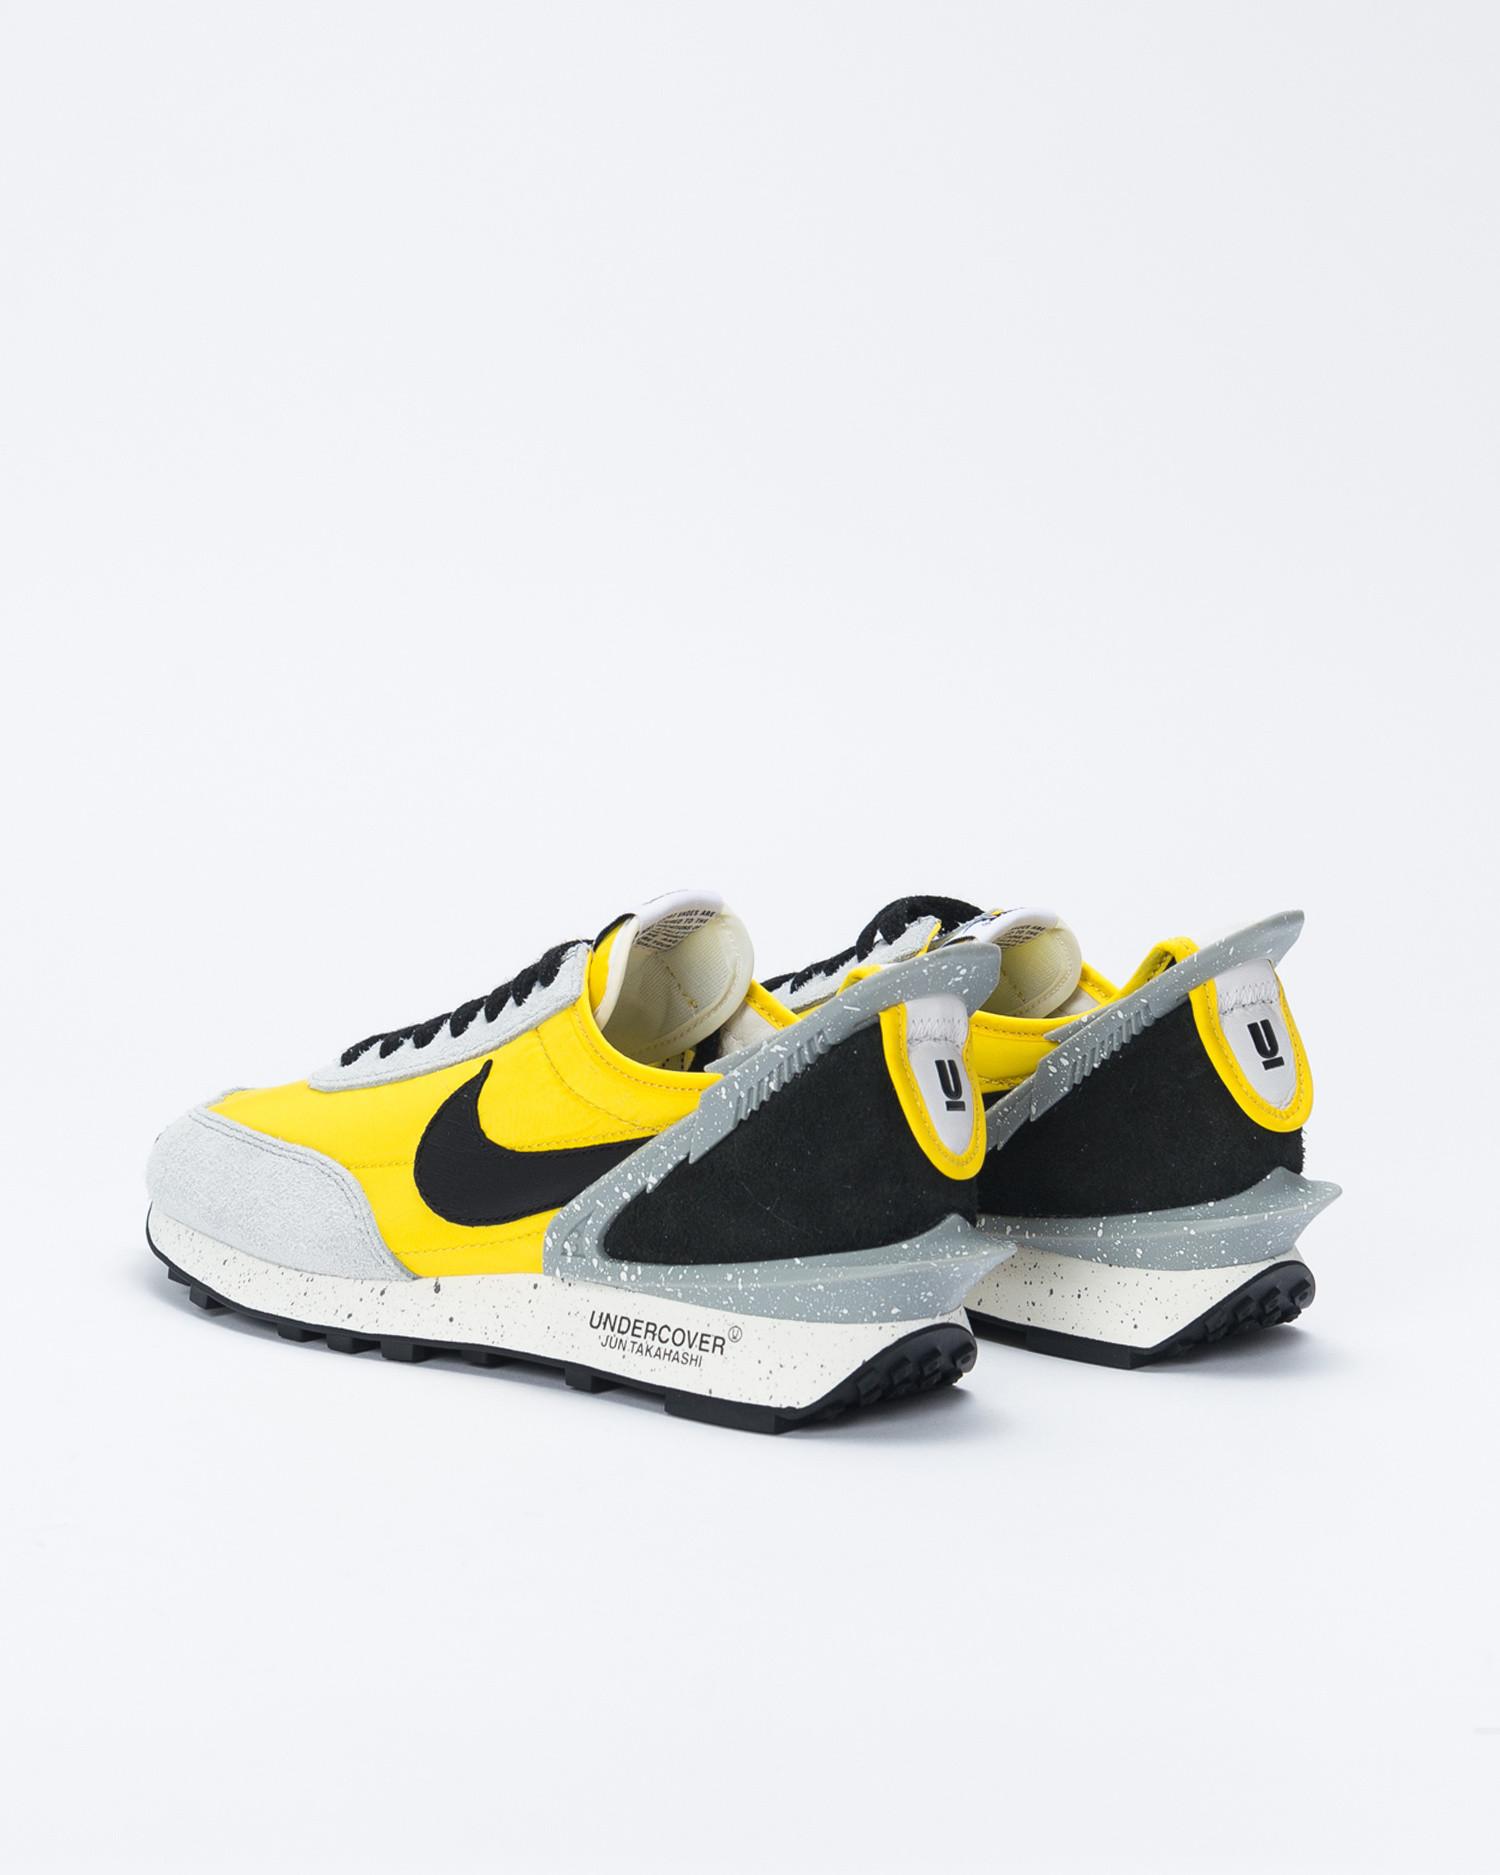 Nike X UNDERCOVER Daybreak Bright Citron/Black-Summit White